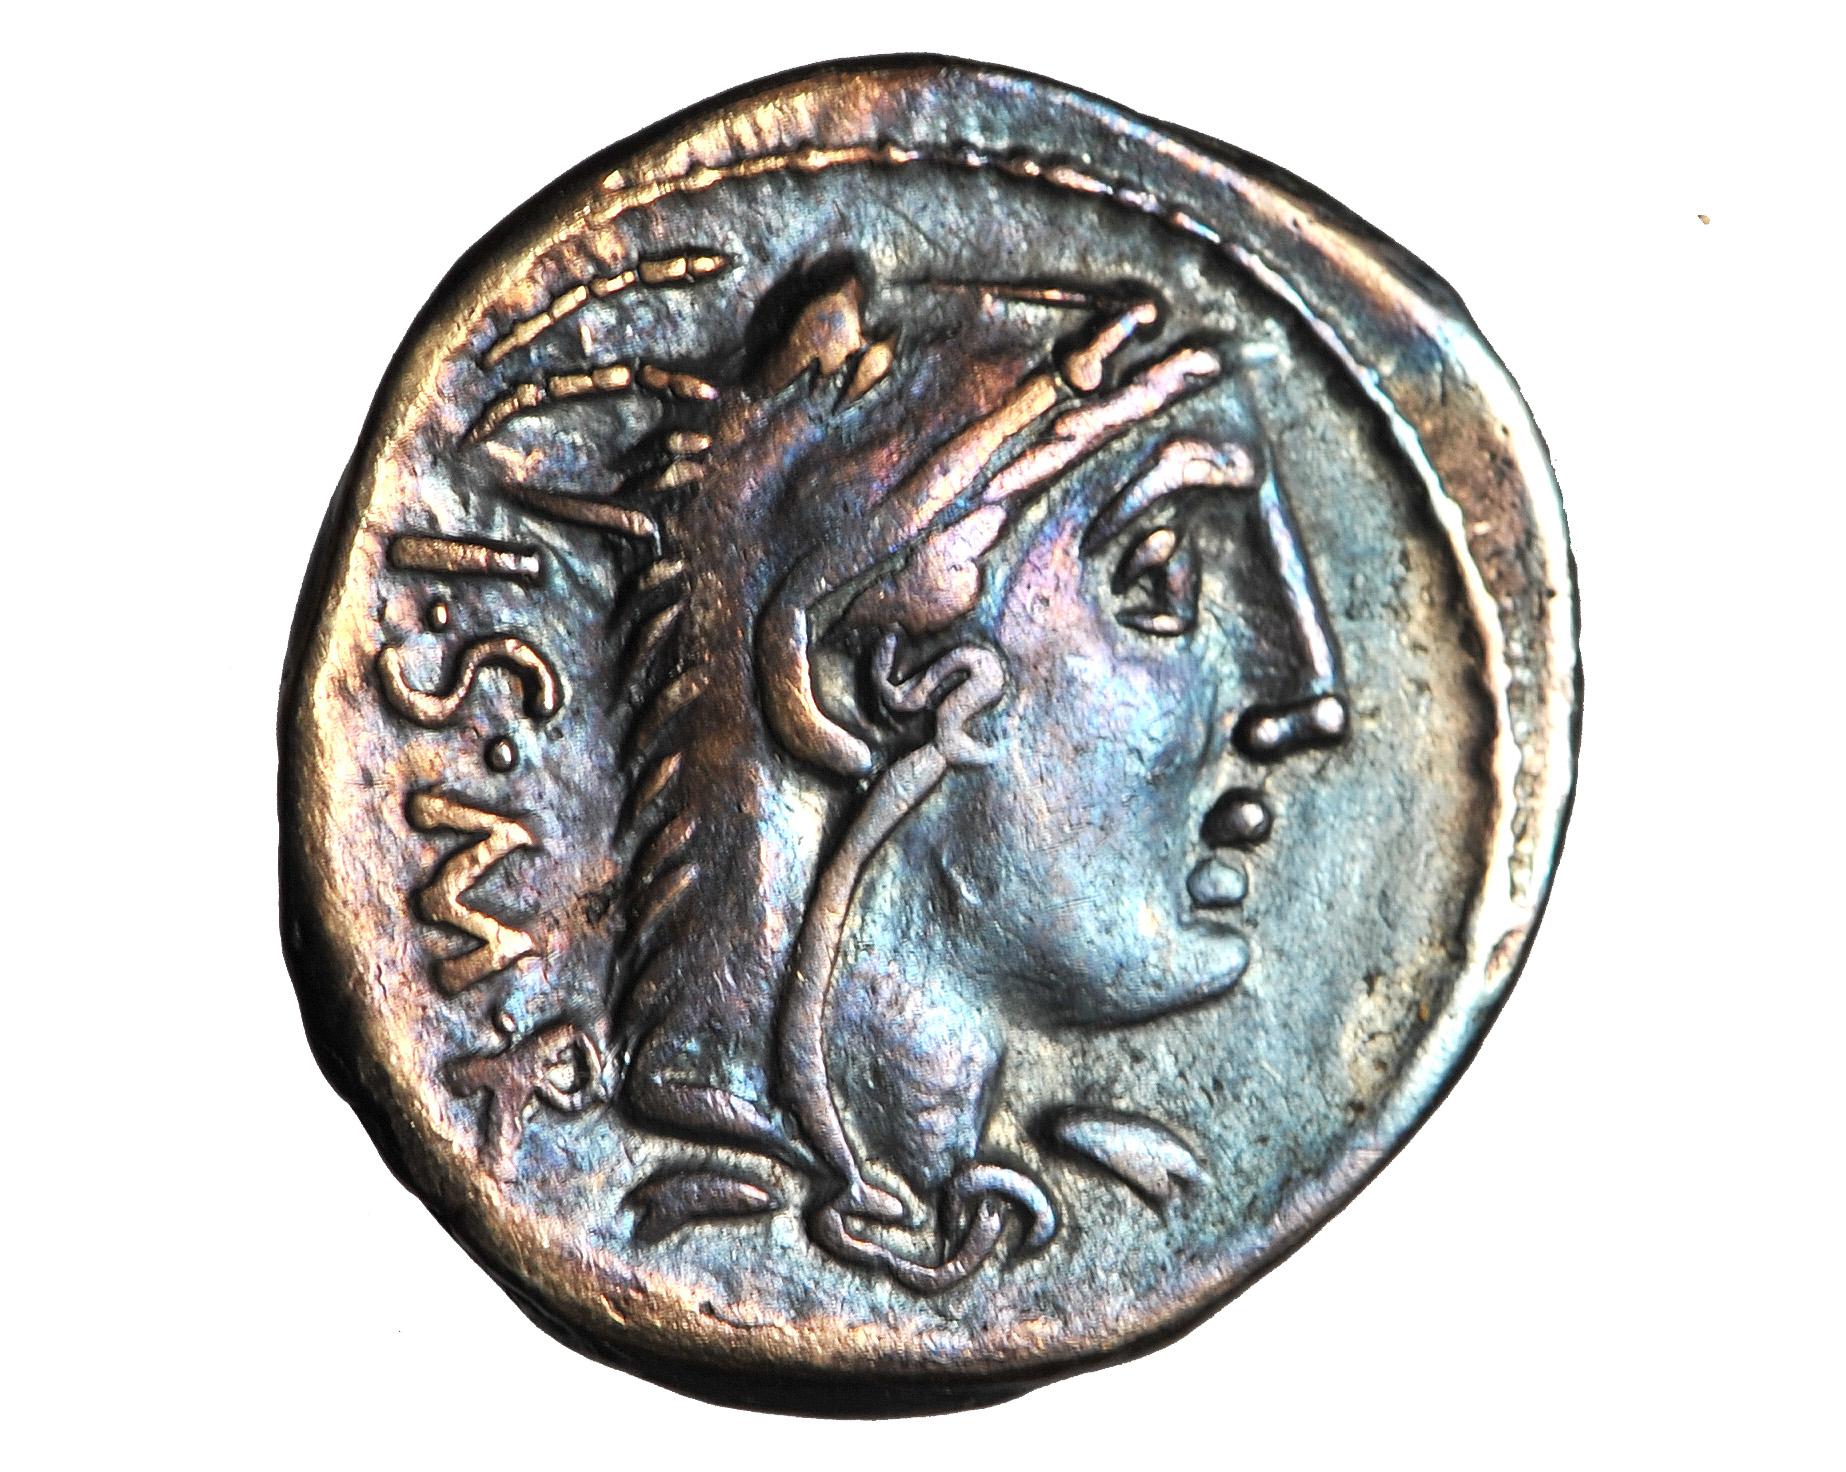 REPUBLIKA, Thorius Balbus, denar, 105 BC, B. ŁADNY